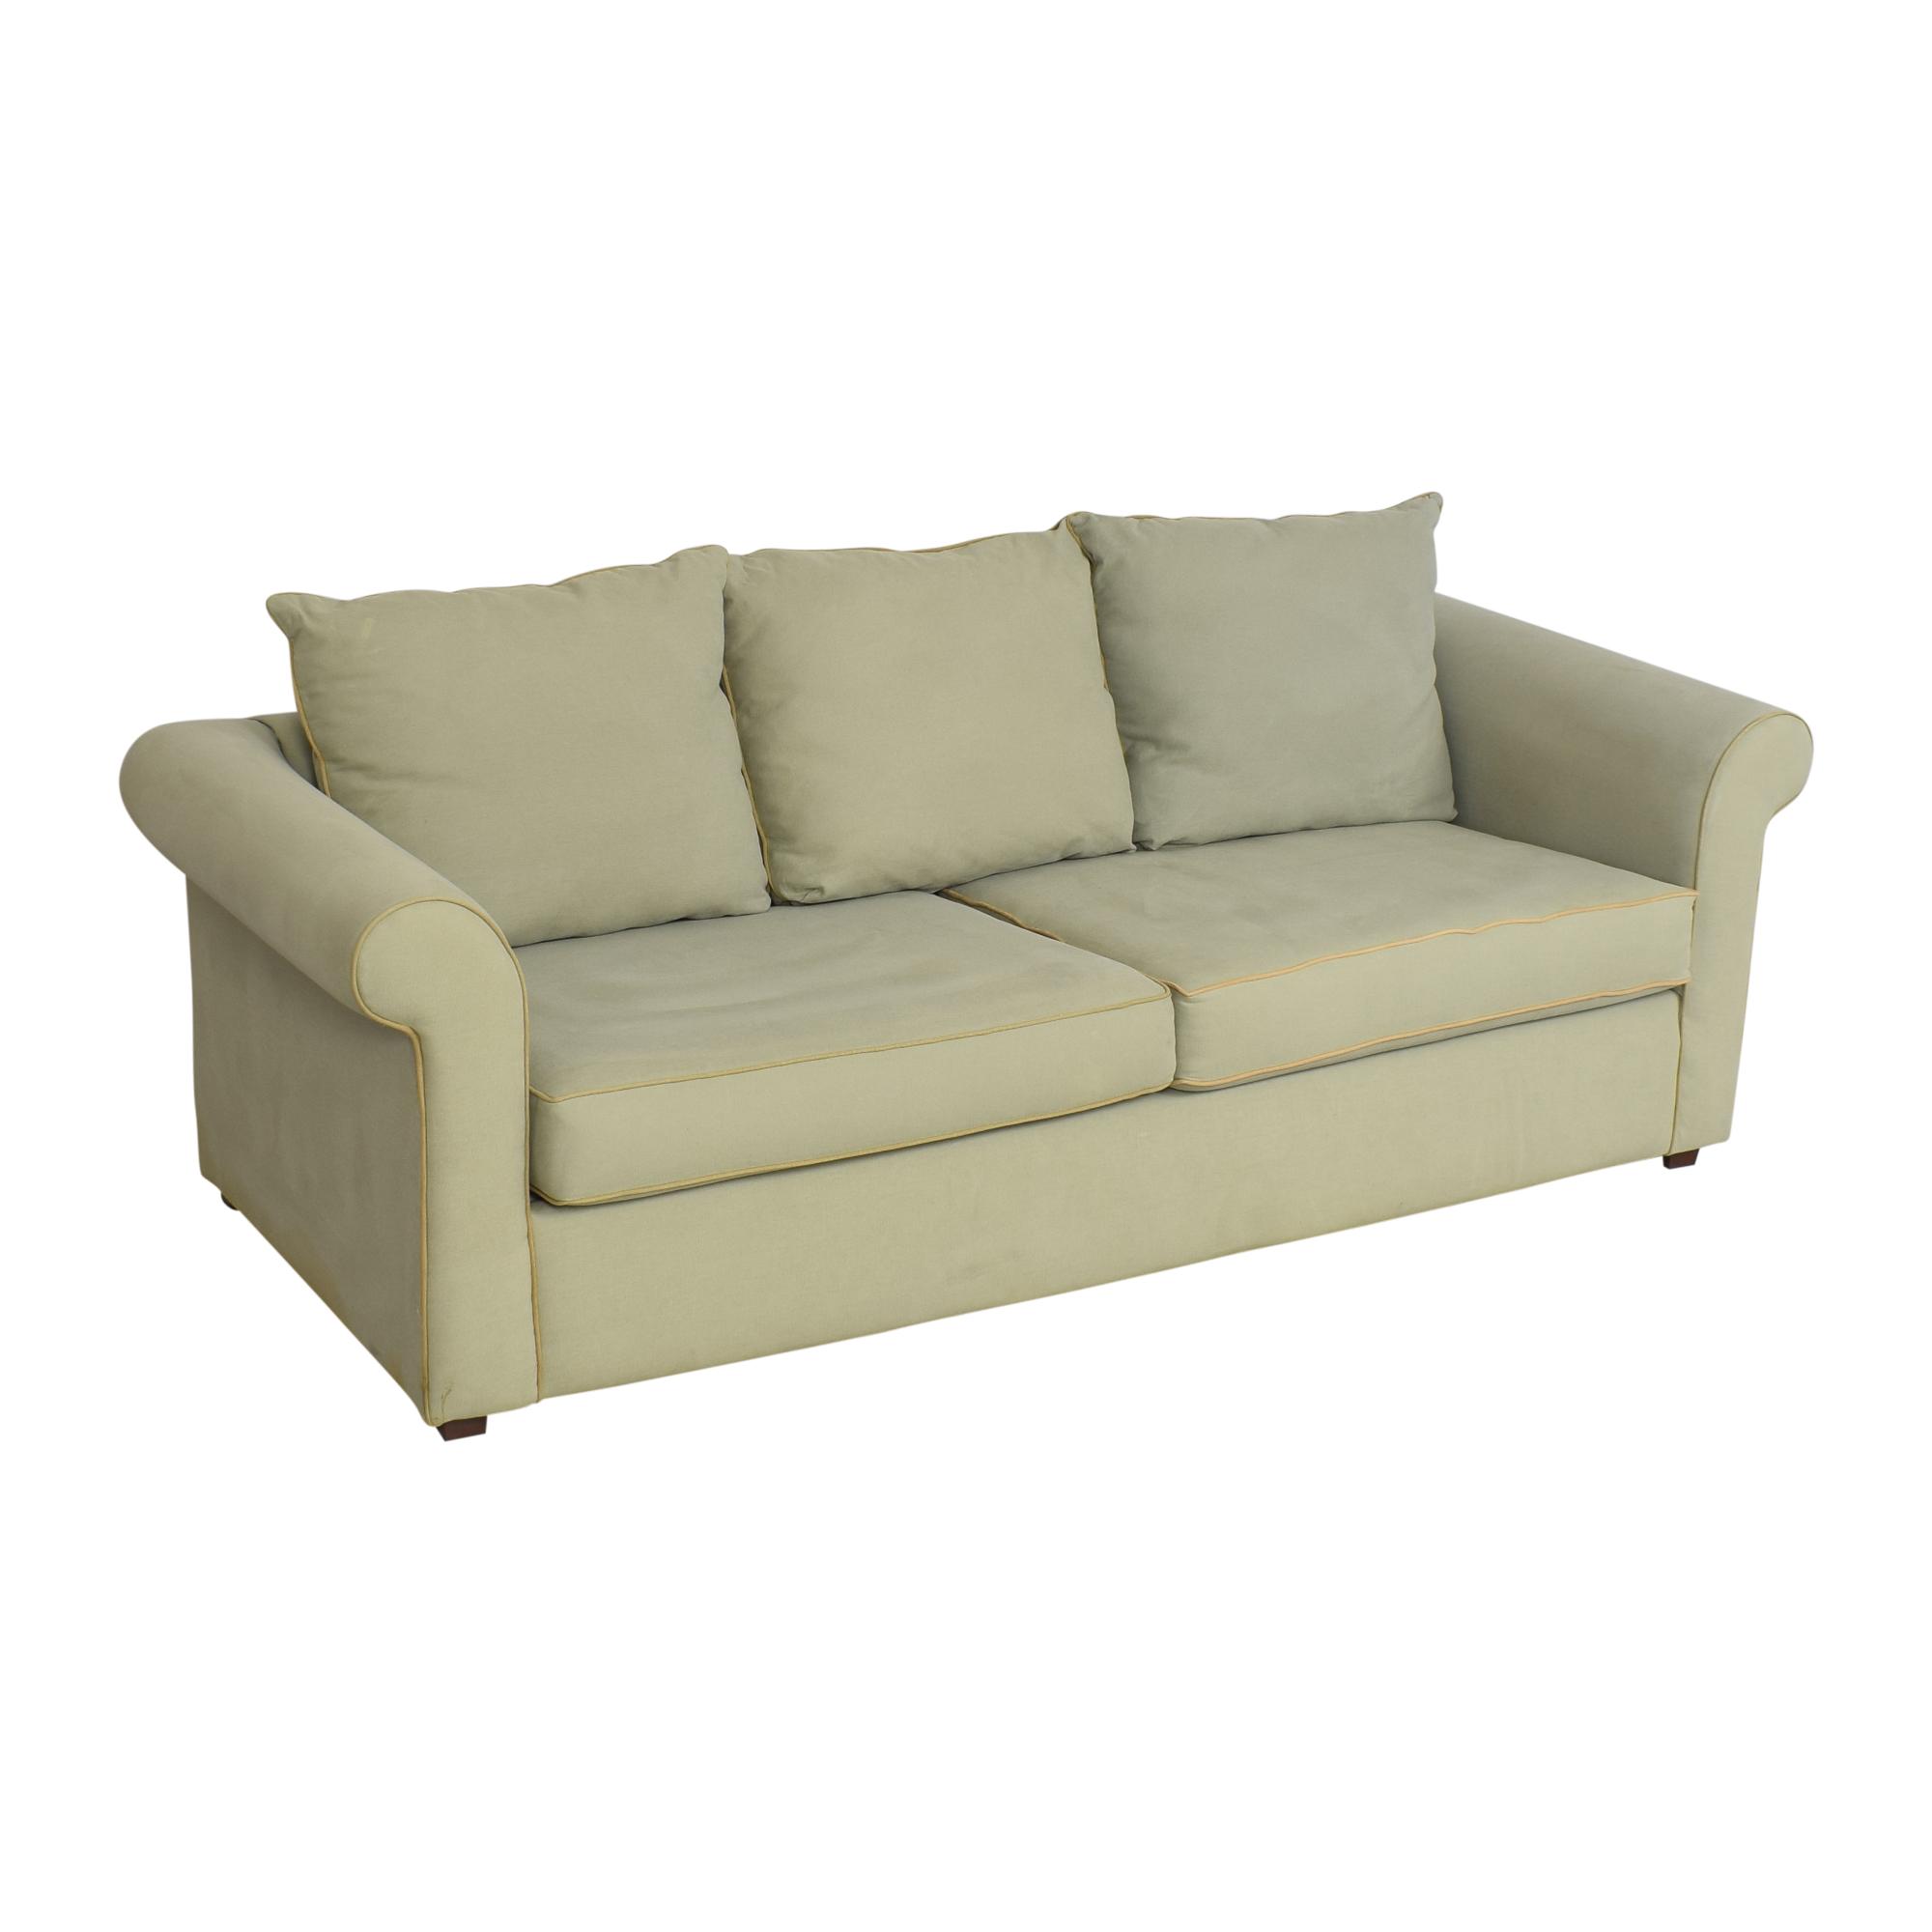 IKEA Two Cushion Sofa / Sofas